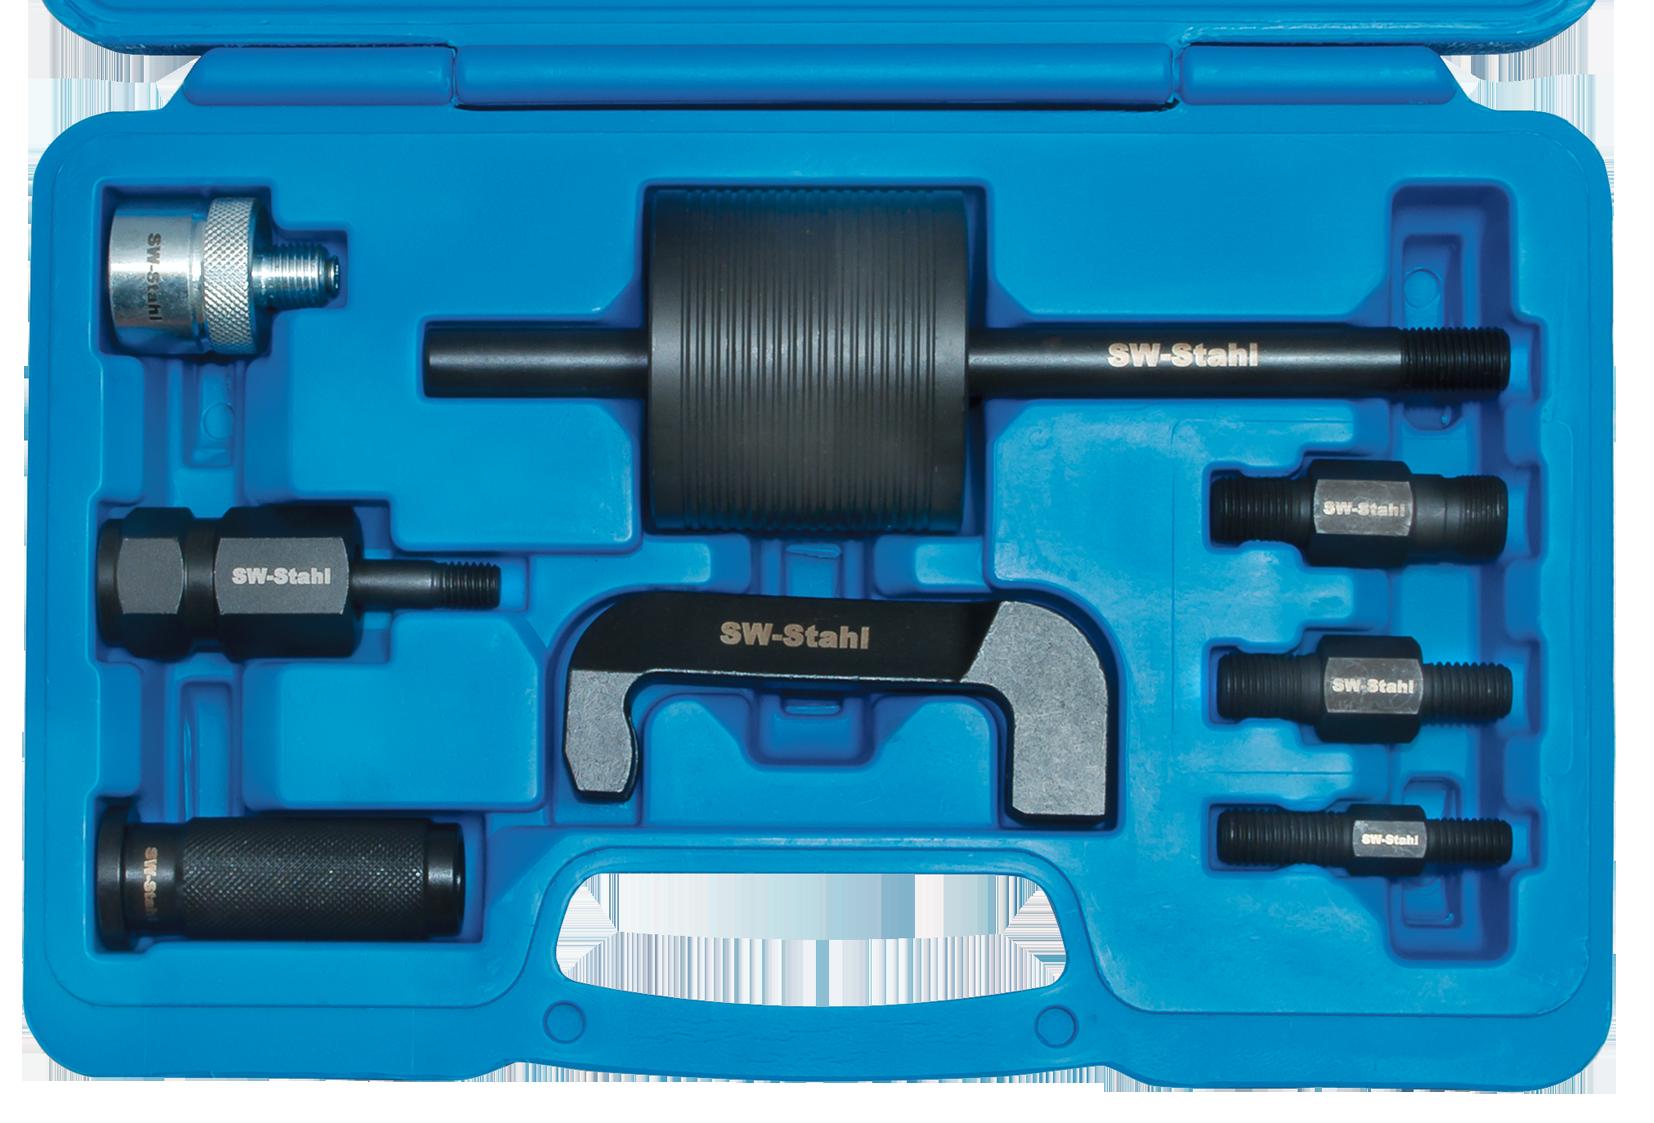 SWSTAHL Assortment of ejector removal tools 03686L